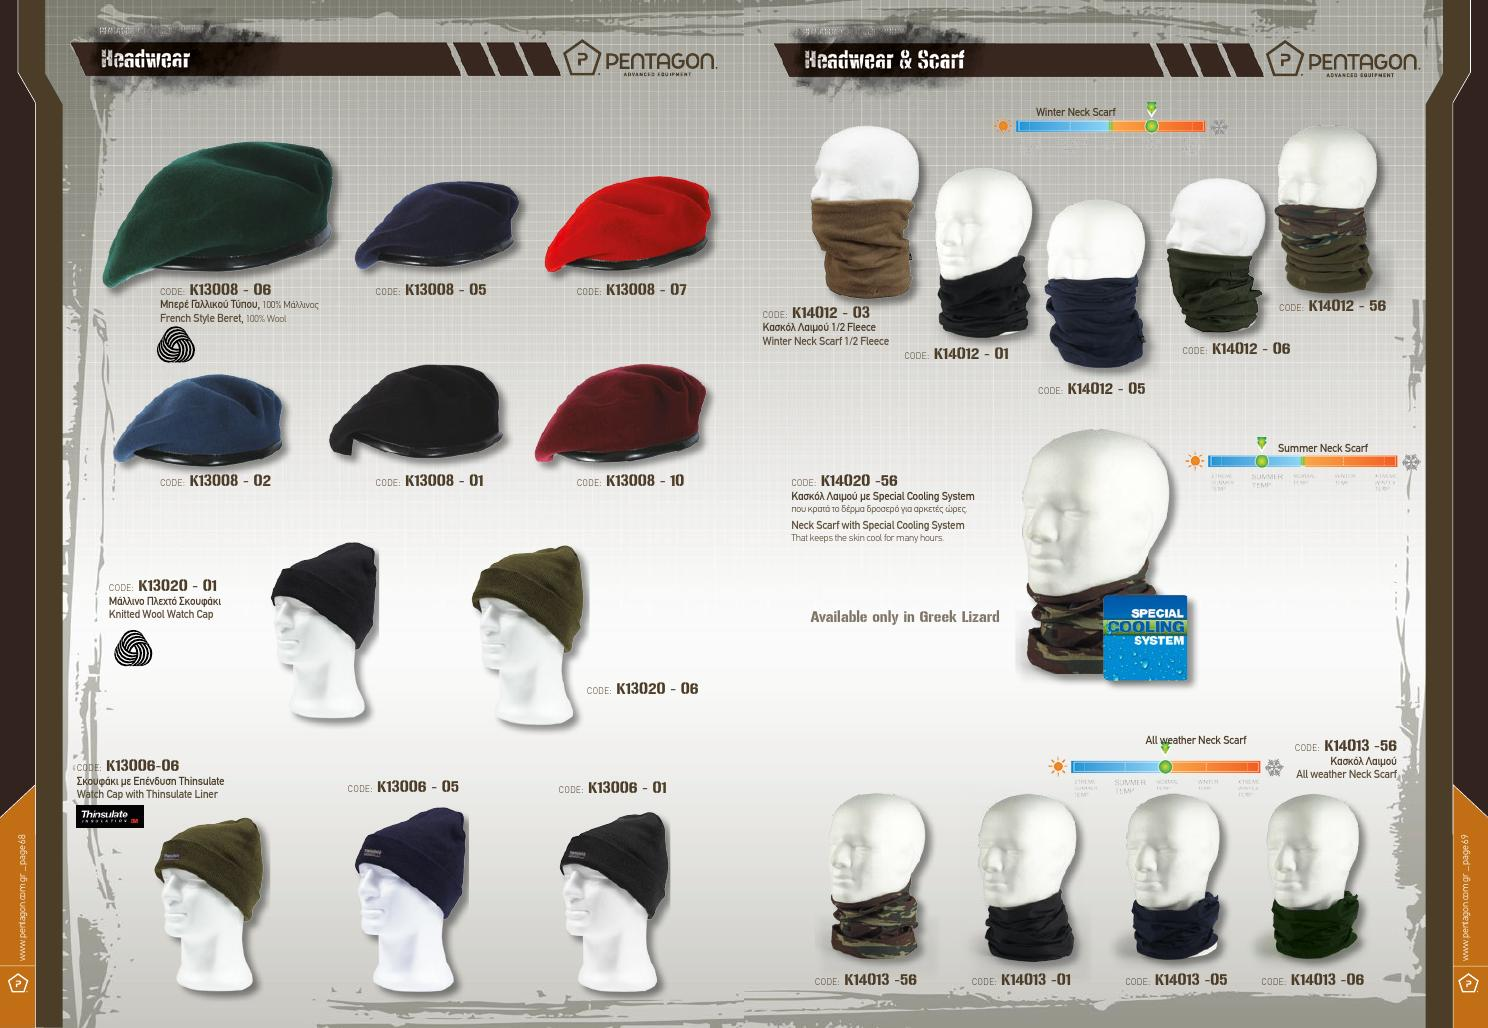 5c3f9ad5bd197 Pentagon s a catalogue 2013 web by Dwrean Aggelies - issuu